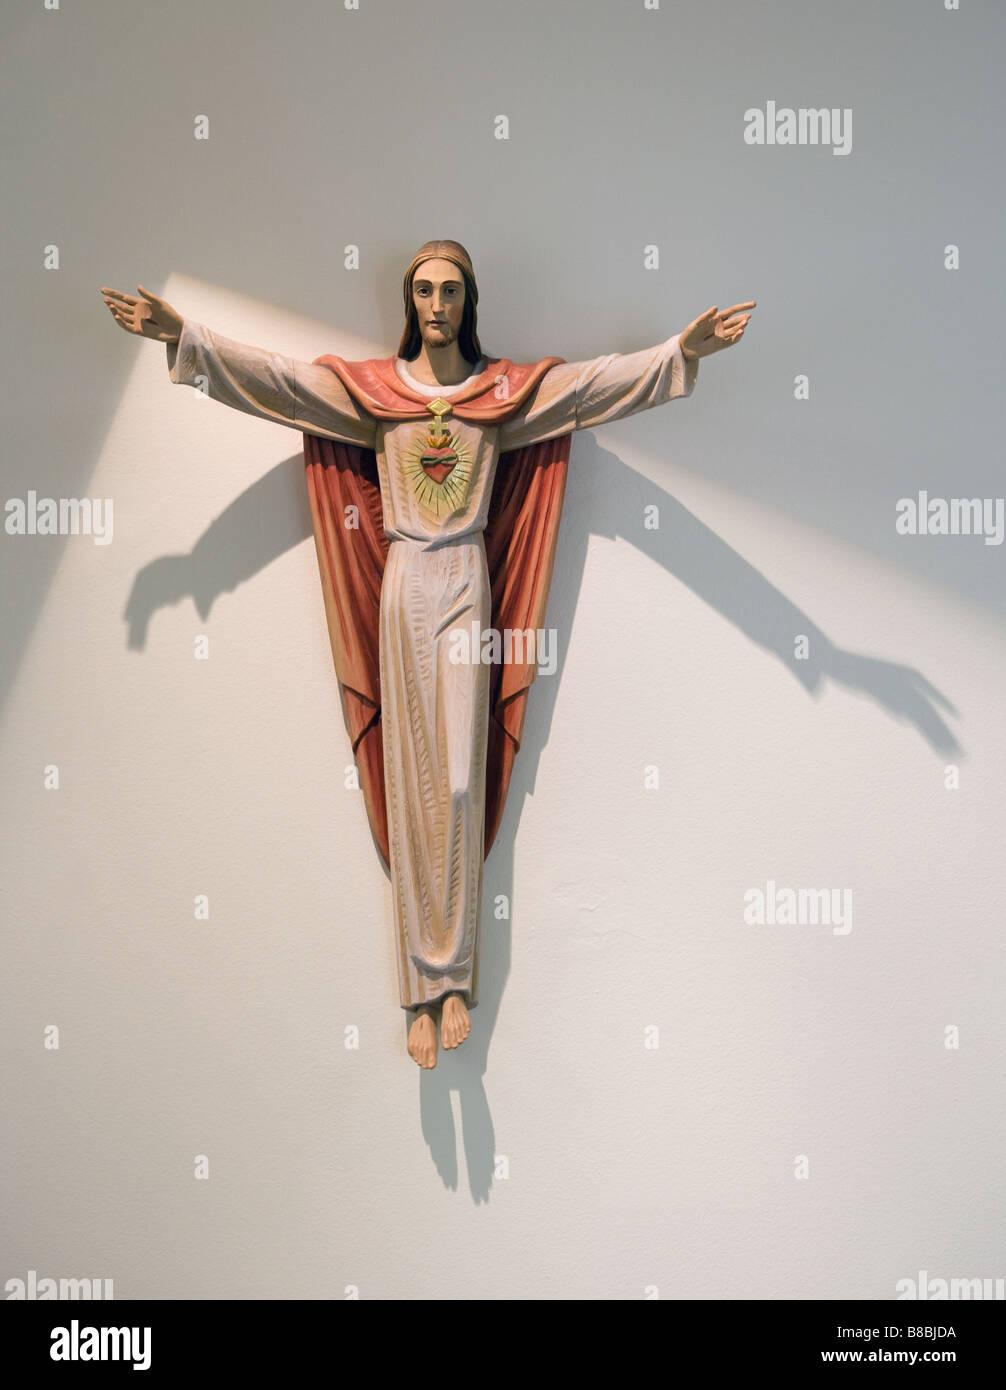 Jesus Christ statue on wall - Stock Image